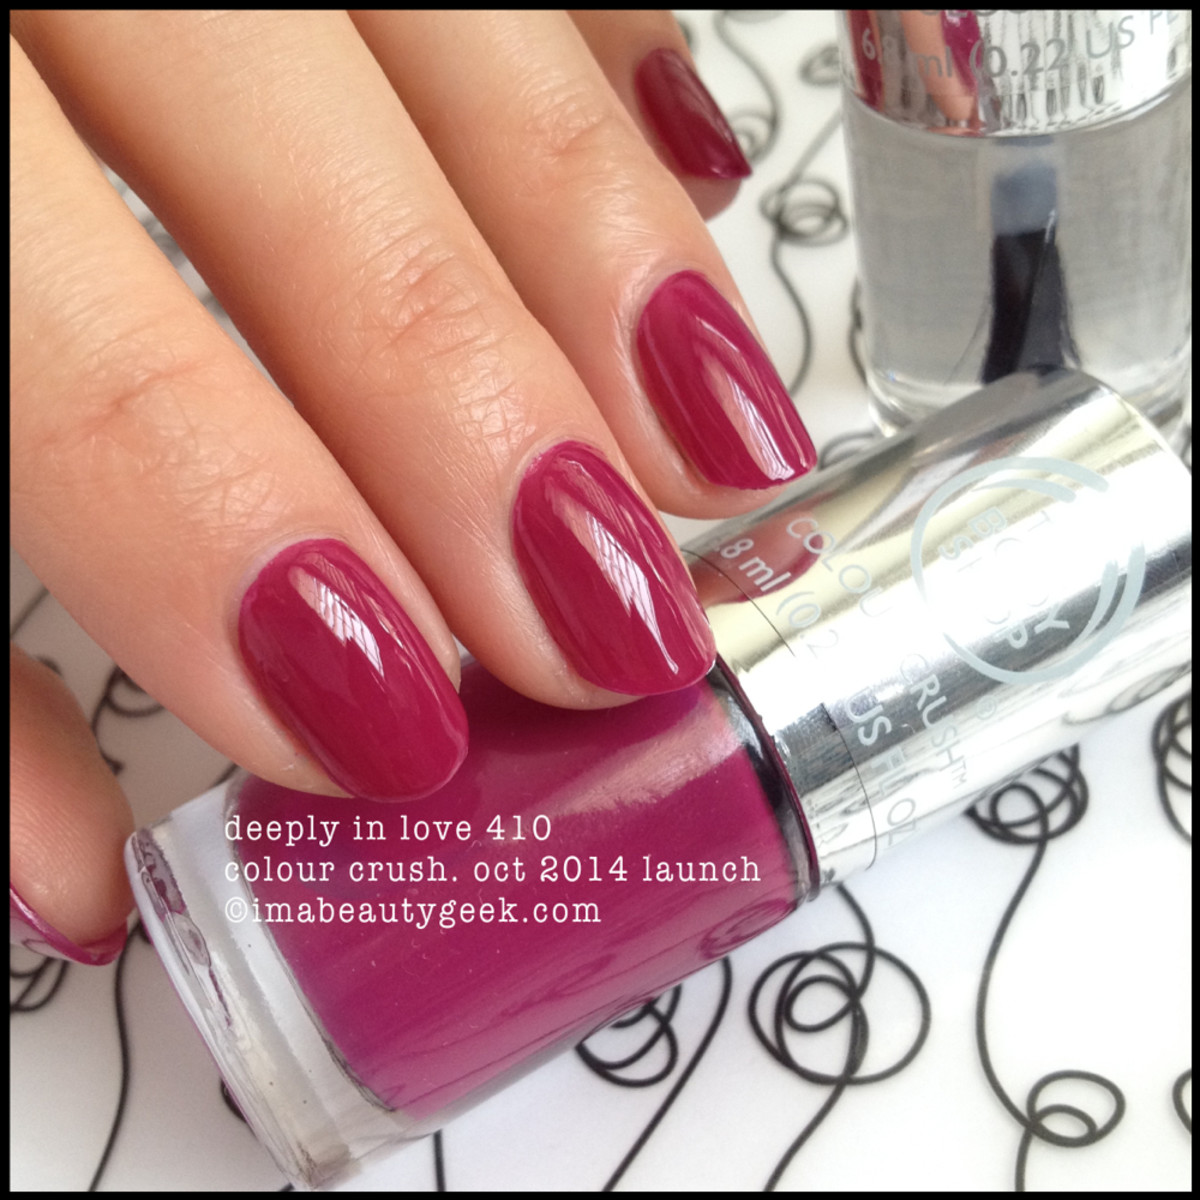 Body Shop Deeply in Love 410 Colour Crush Polish